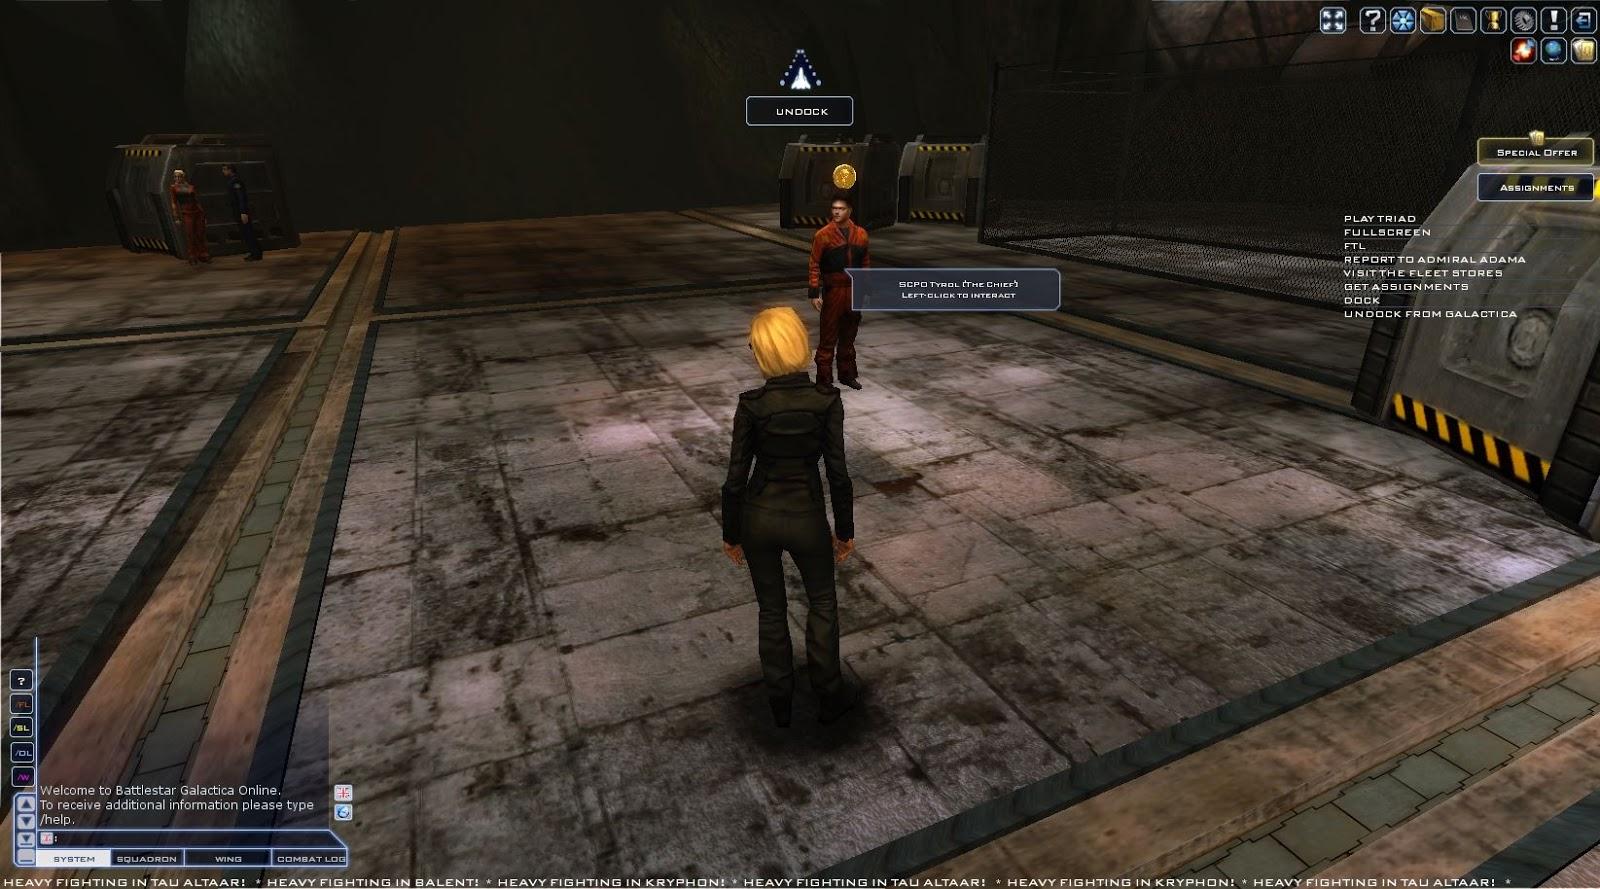 Battlestar Galactica Online - SCPO Tyrol